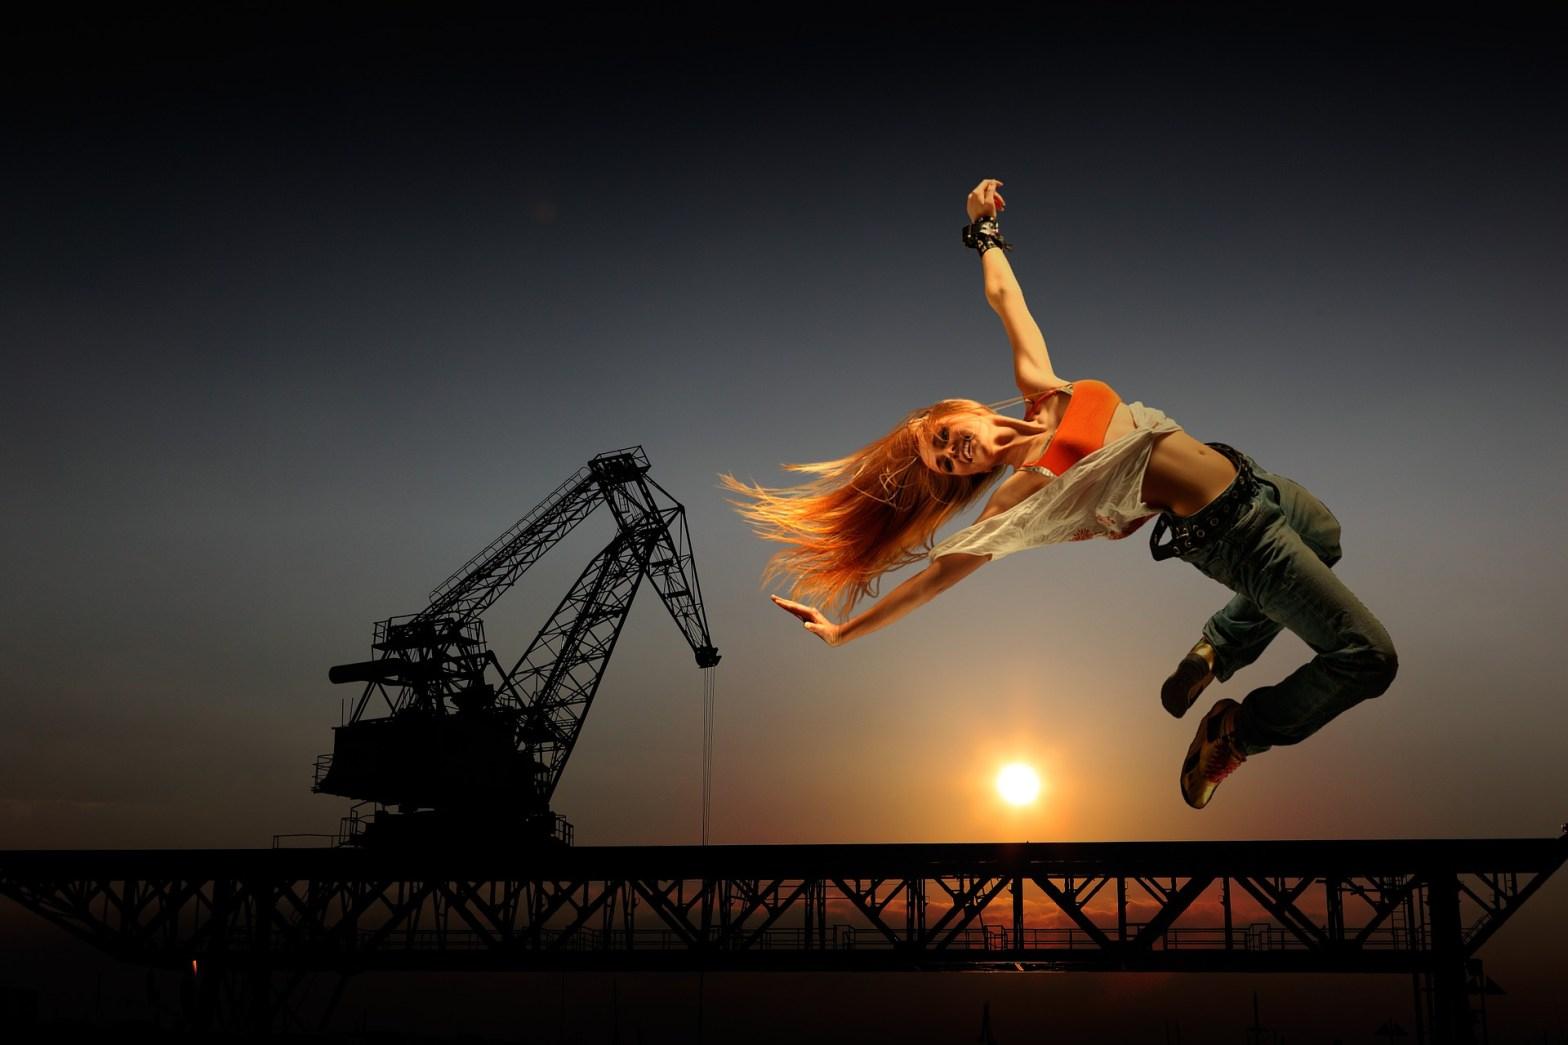 girls in jeans leap - artistic